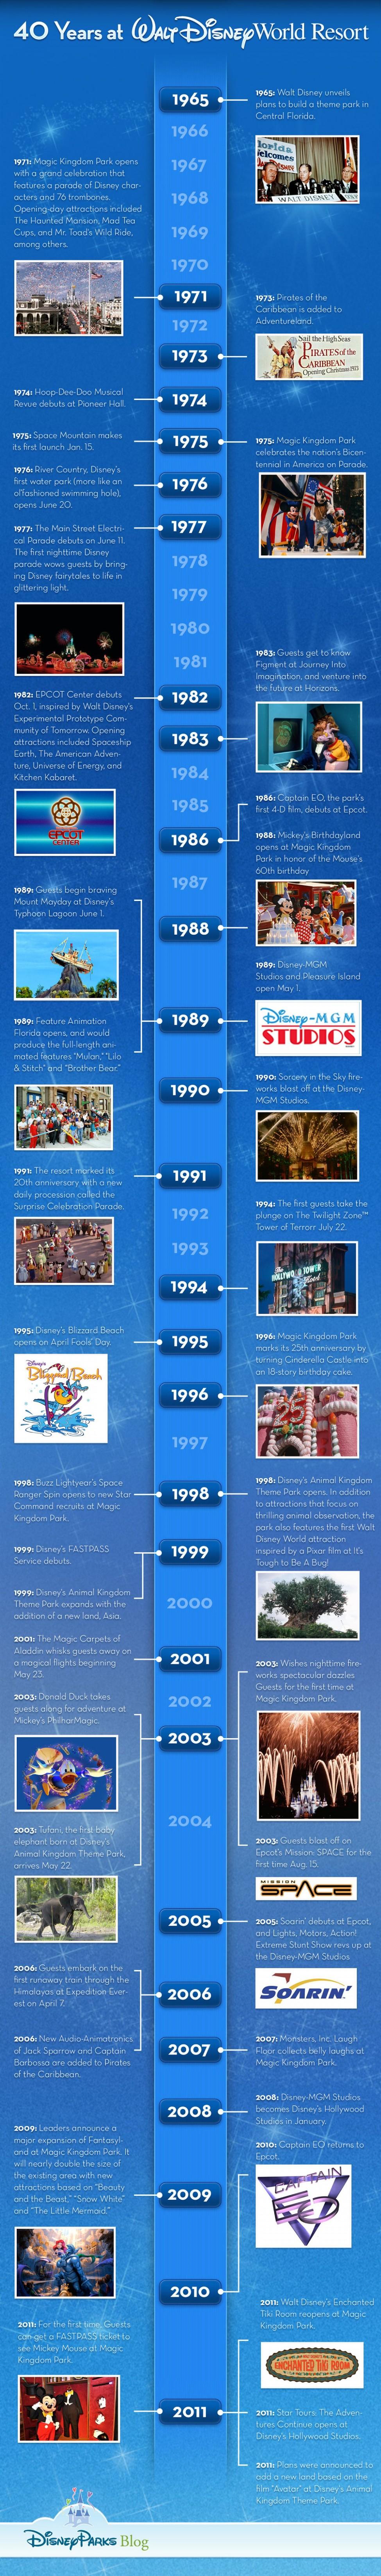 40 years of Walt Disney World Resort